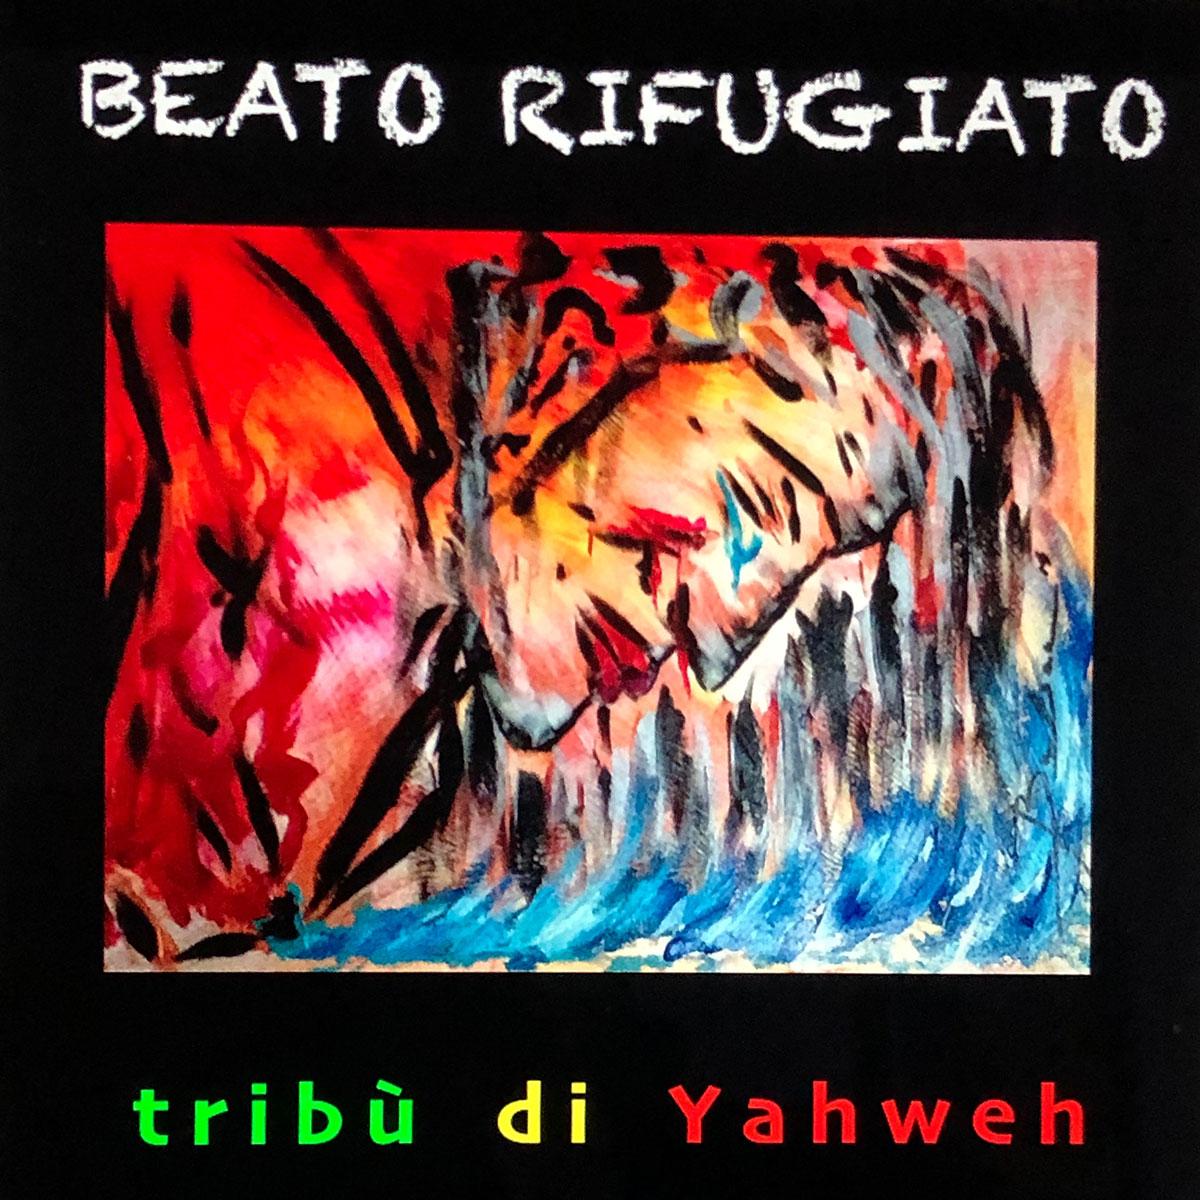 https://www.tribudiyahweh.com/wp/wp-content/uploads/2019/02/Beato-rifugiato.jpg